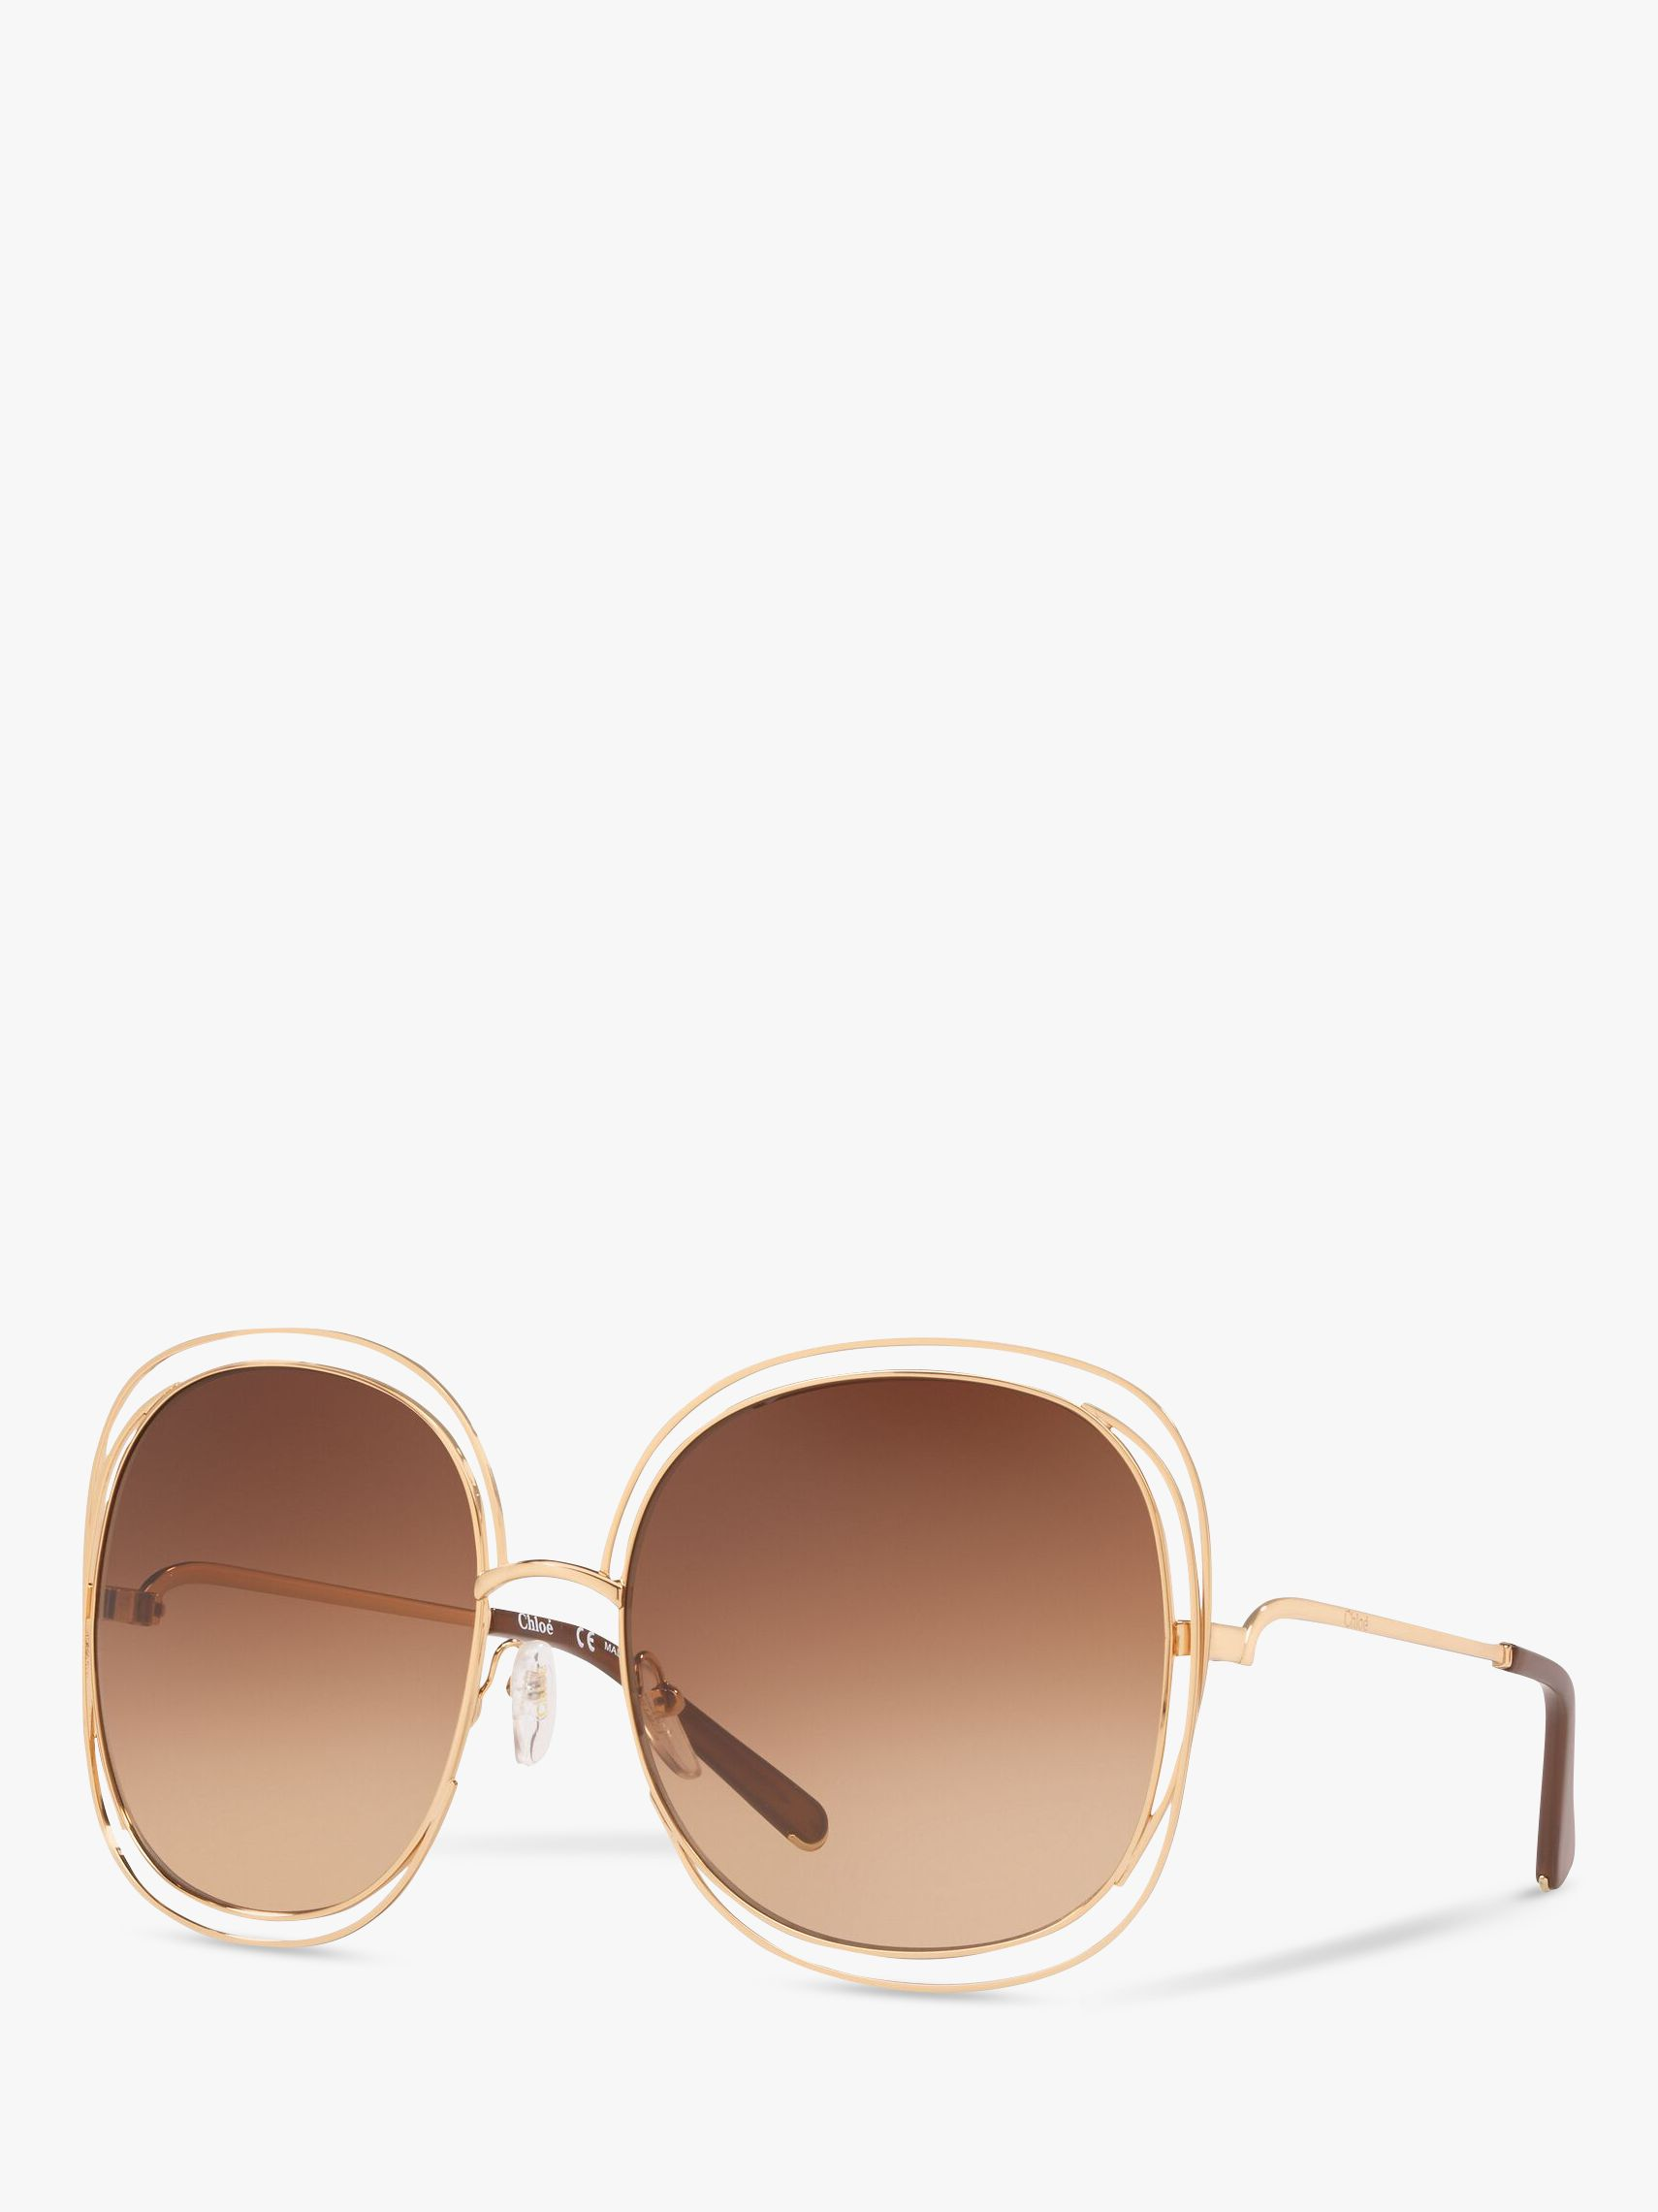 Chloe Chloé CE126S Women's Double Rim Round Sunglasses, Gold/Pink